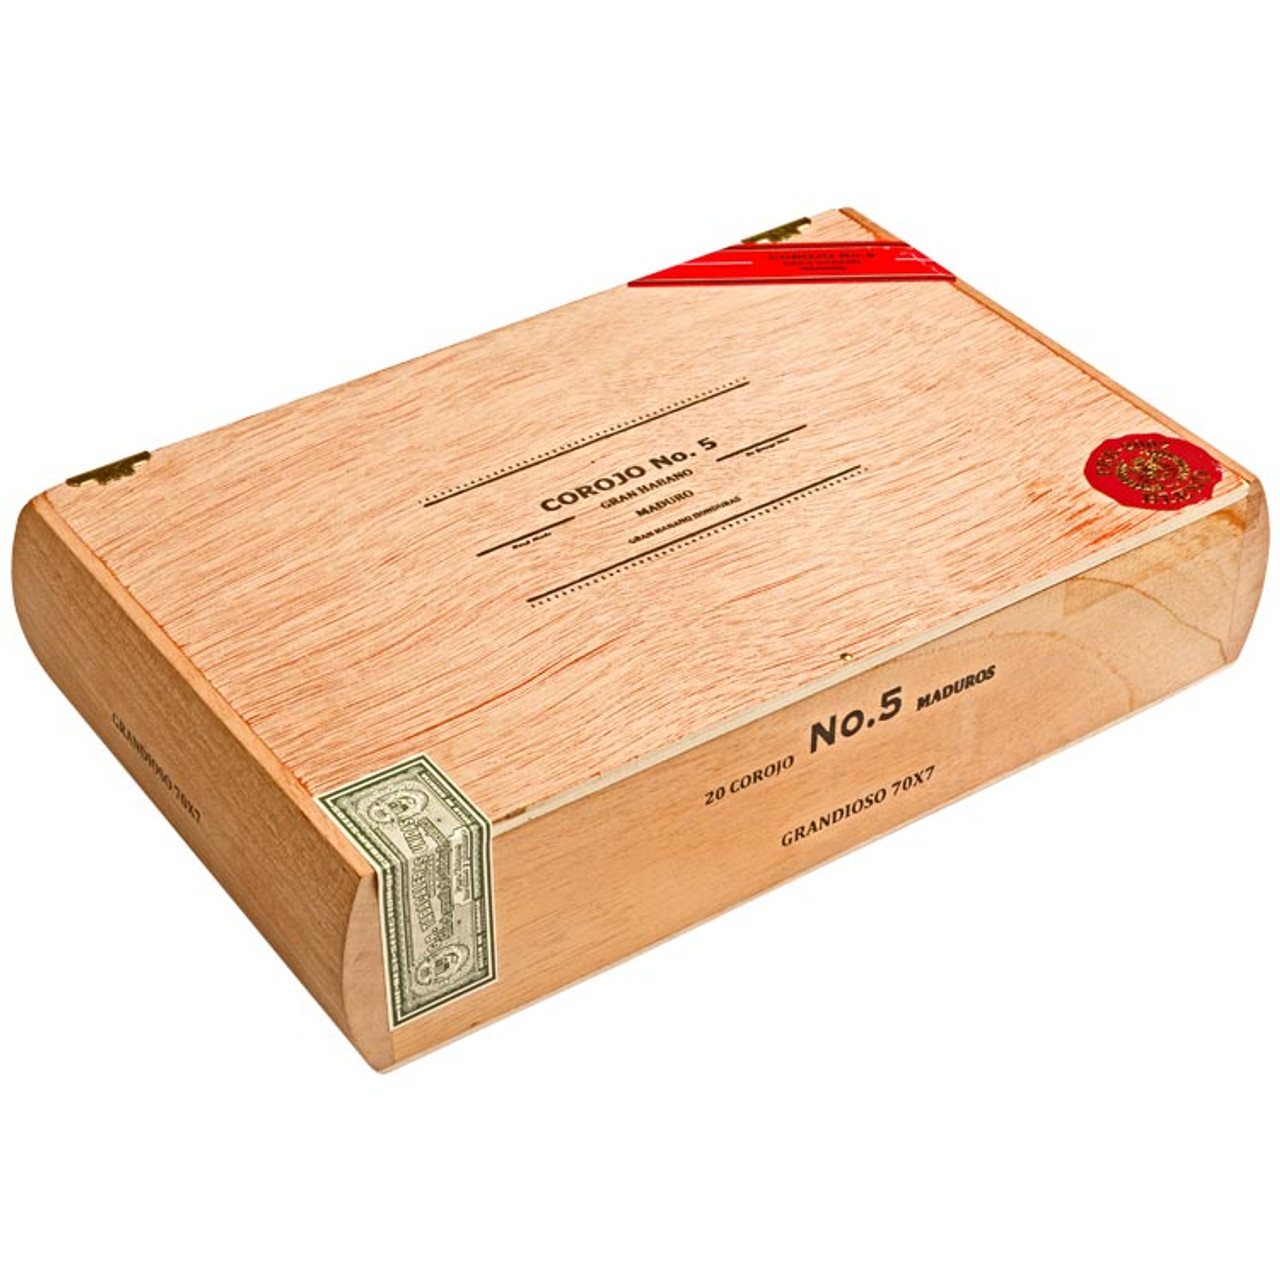 Gran Habano #5 Maduro Grandioso Cigars - 7 x 70 (Box of 20)